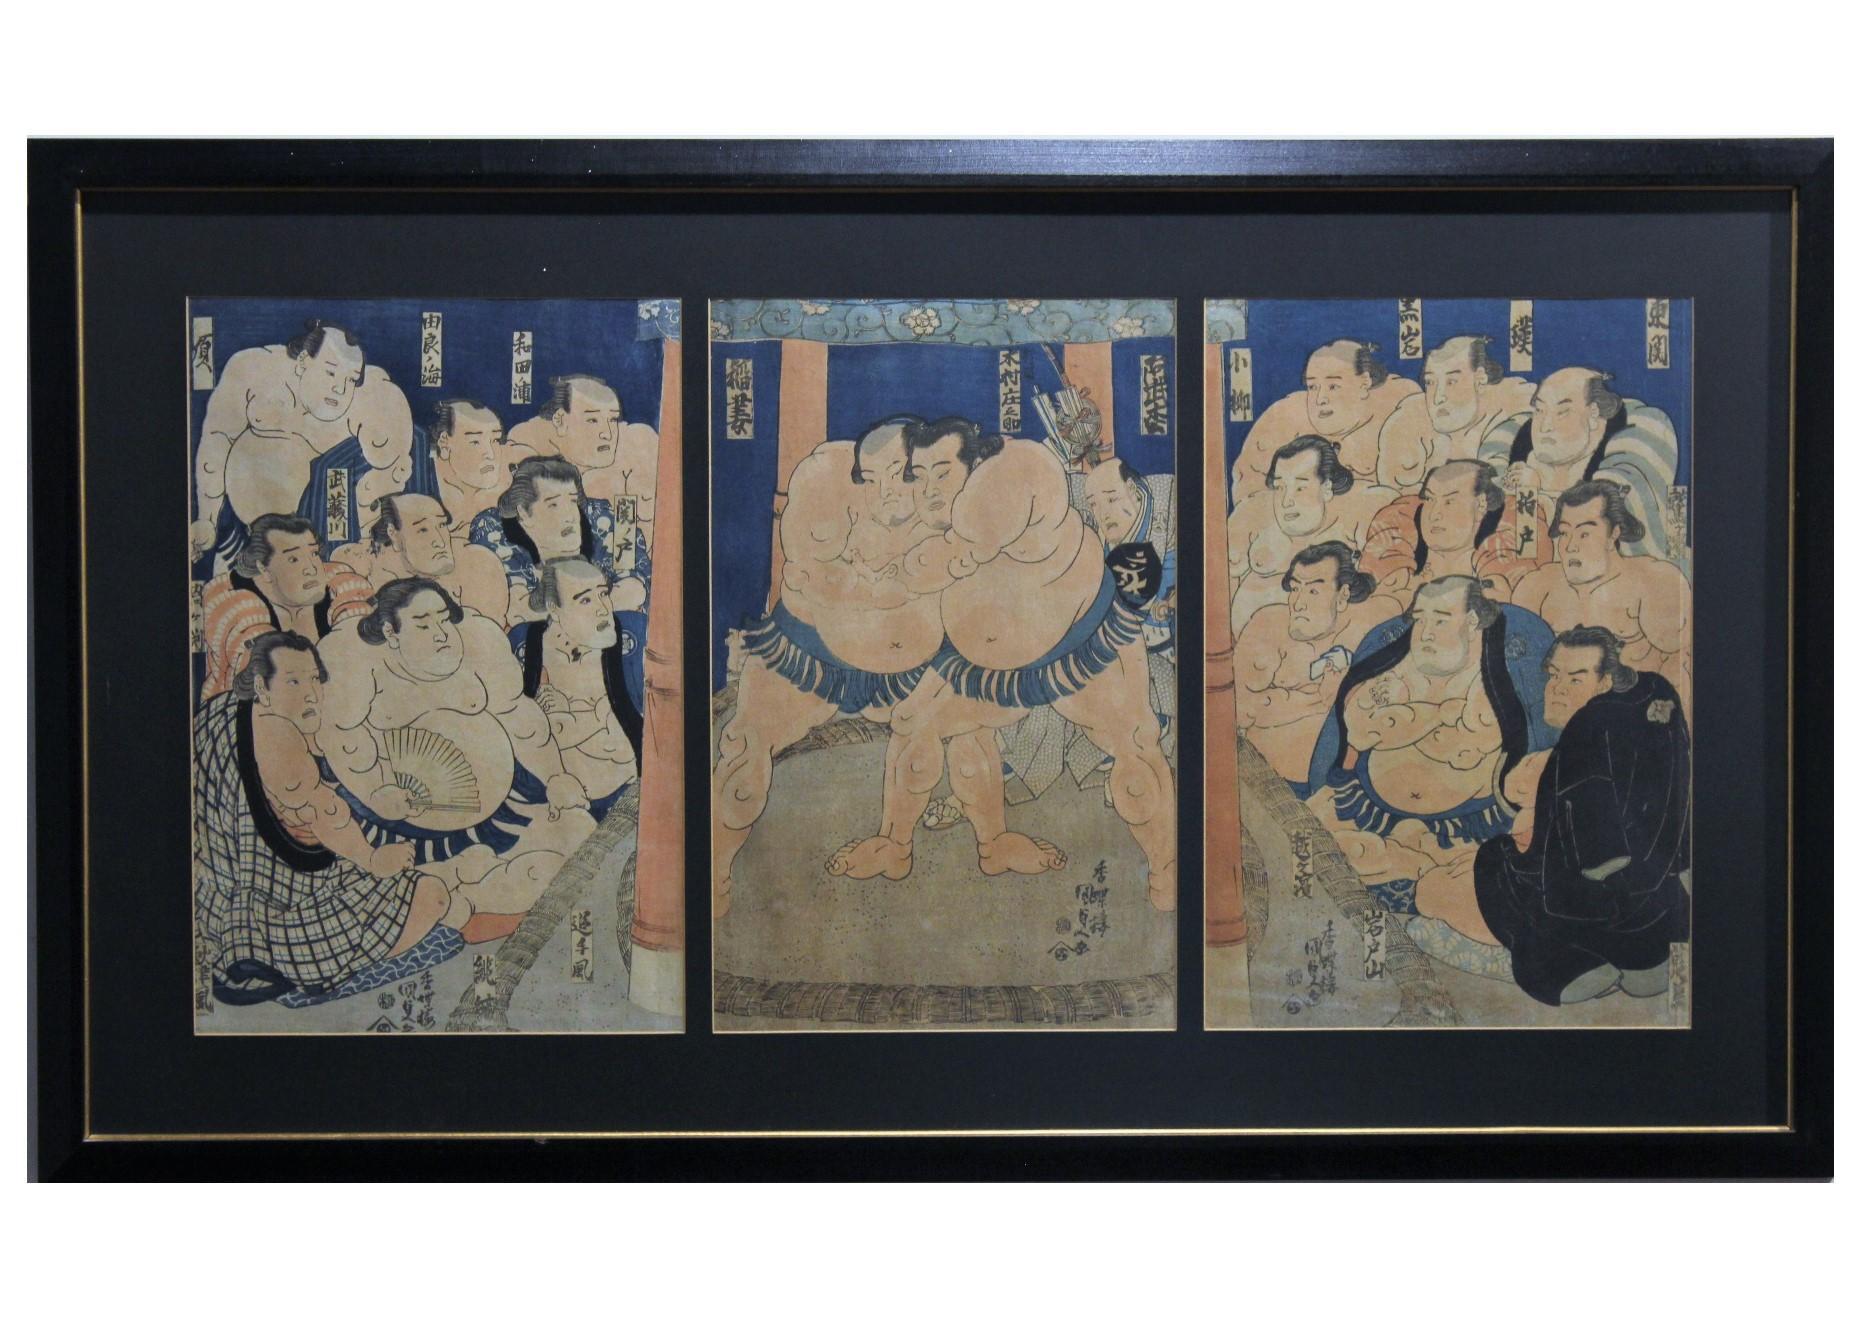 """Inazuma vs Abumatsu on the Dohyo"" Sumo Wrestle Triptych"